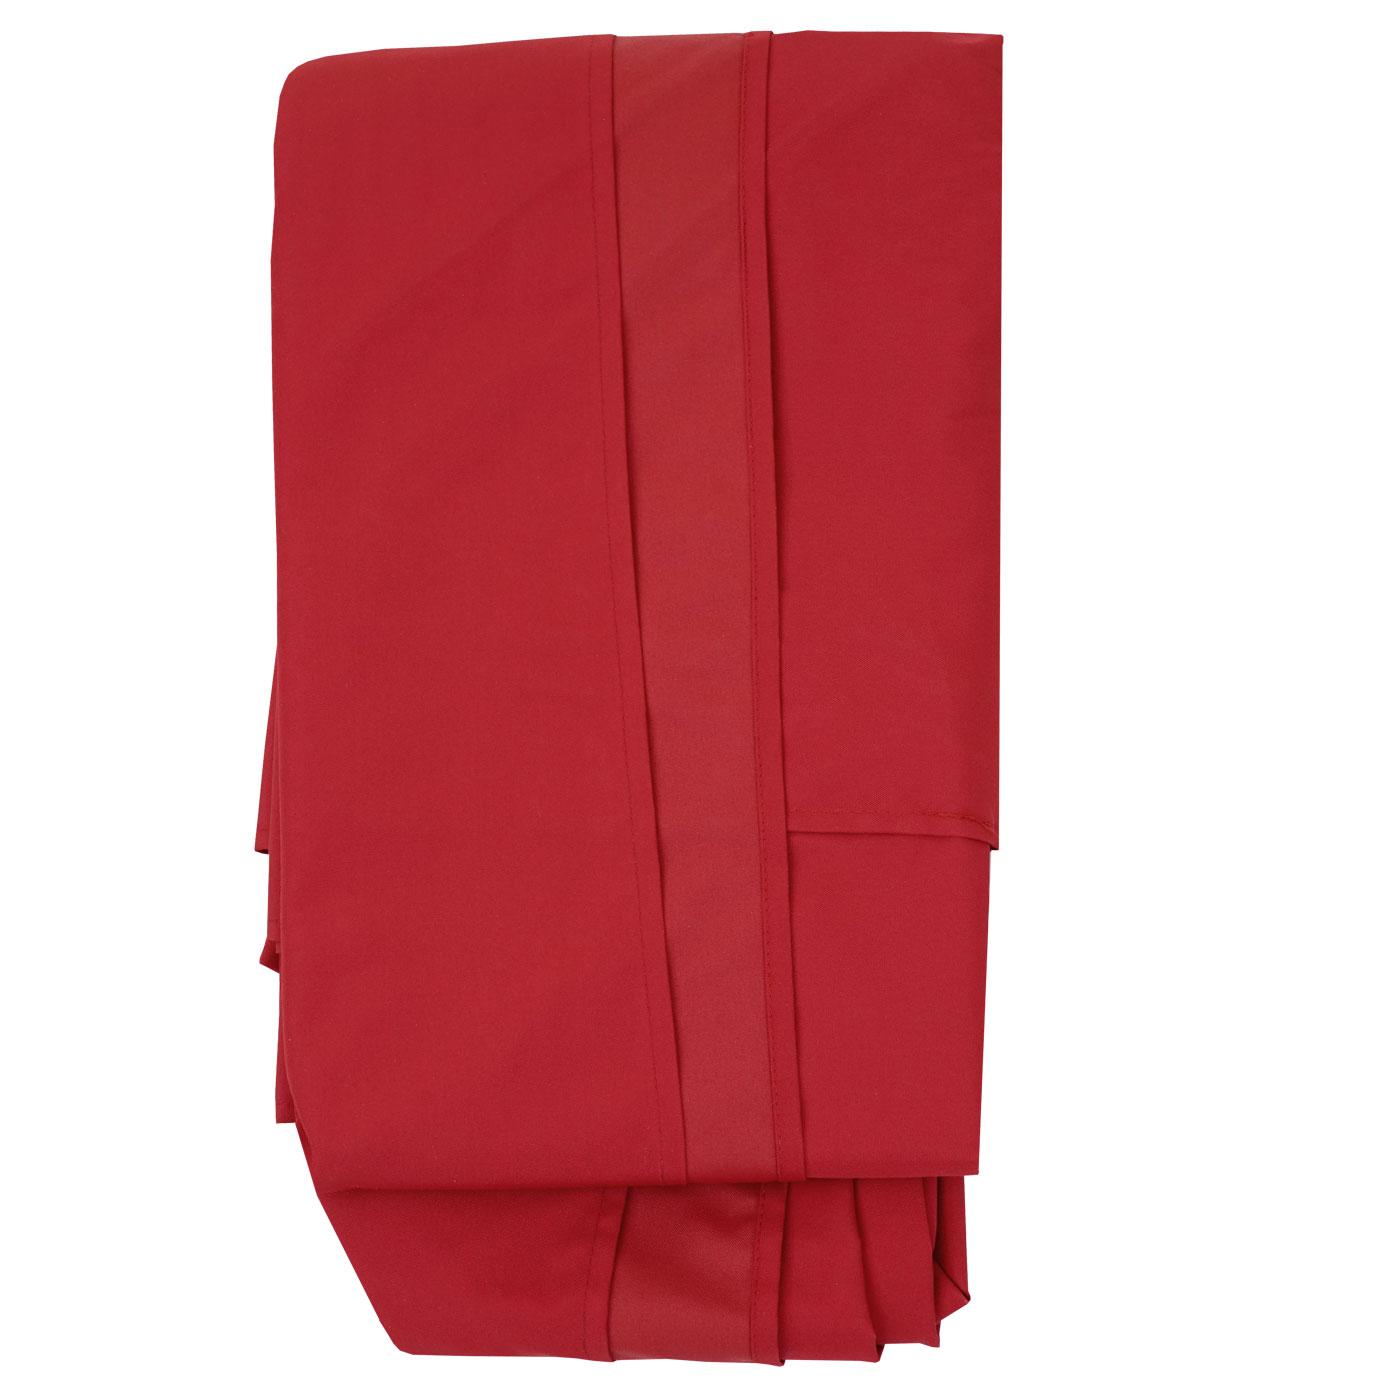 bezug f r luxus ampelschirm hwc sonnenschirmbezug bespannung ersatzbezug 3x4m rot. Black Bedroom Furniture Sets. Home Design Ideas